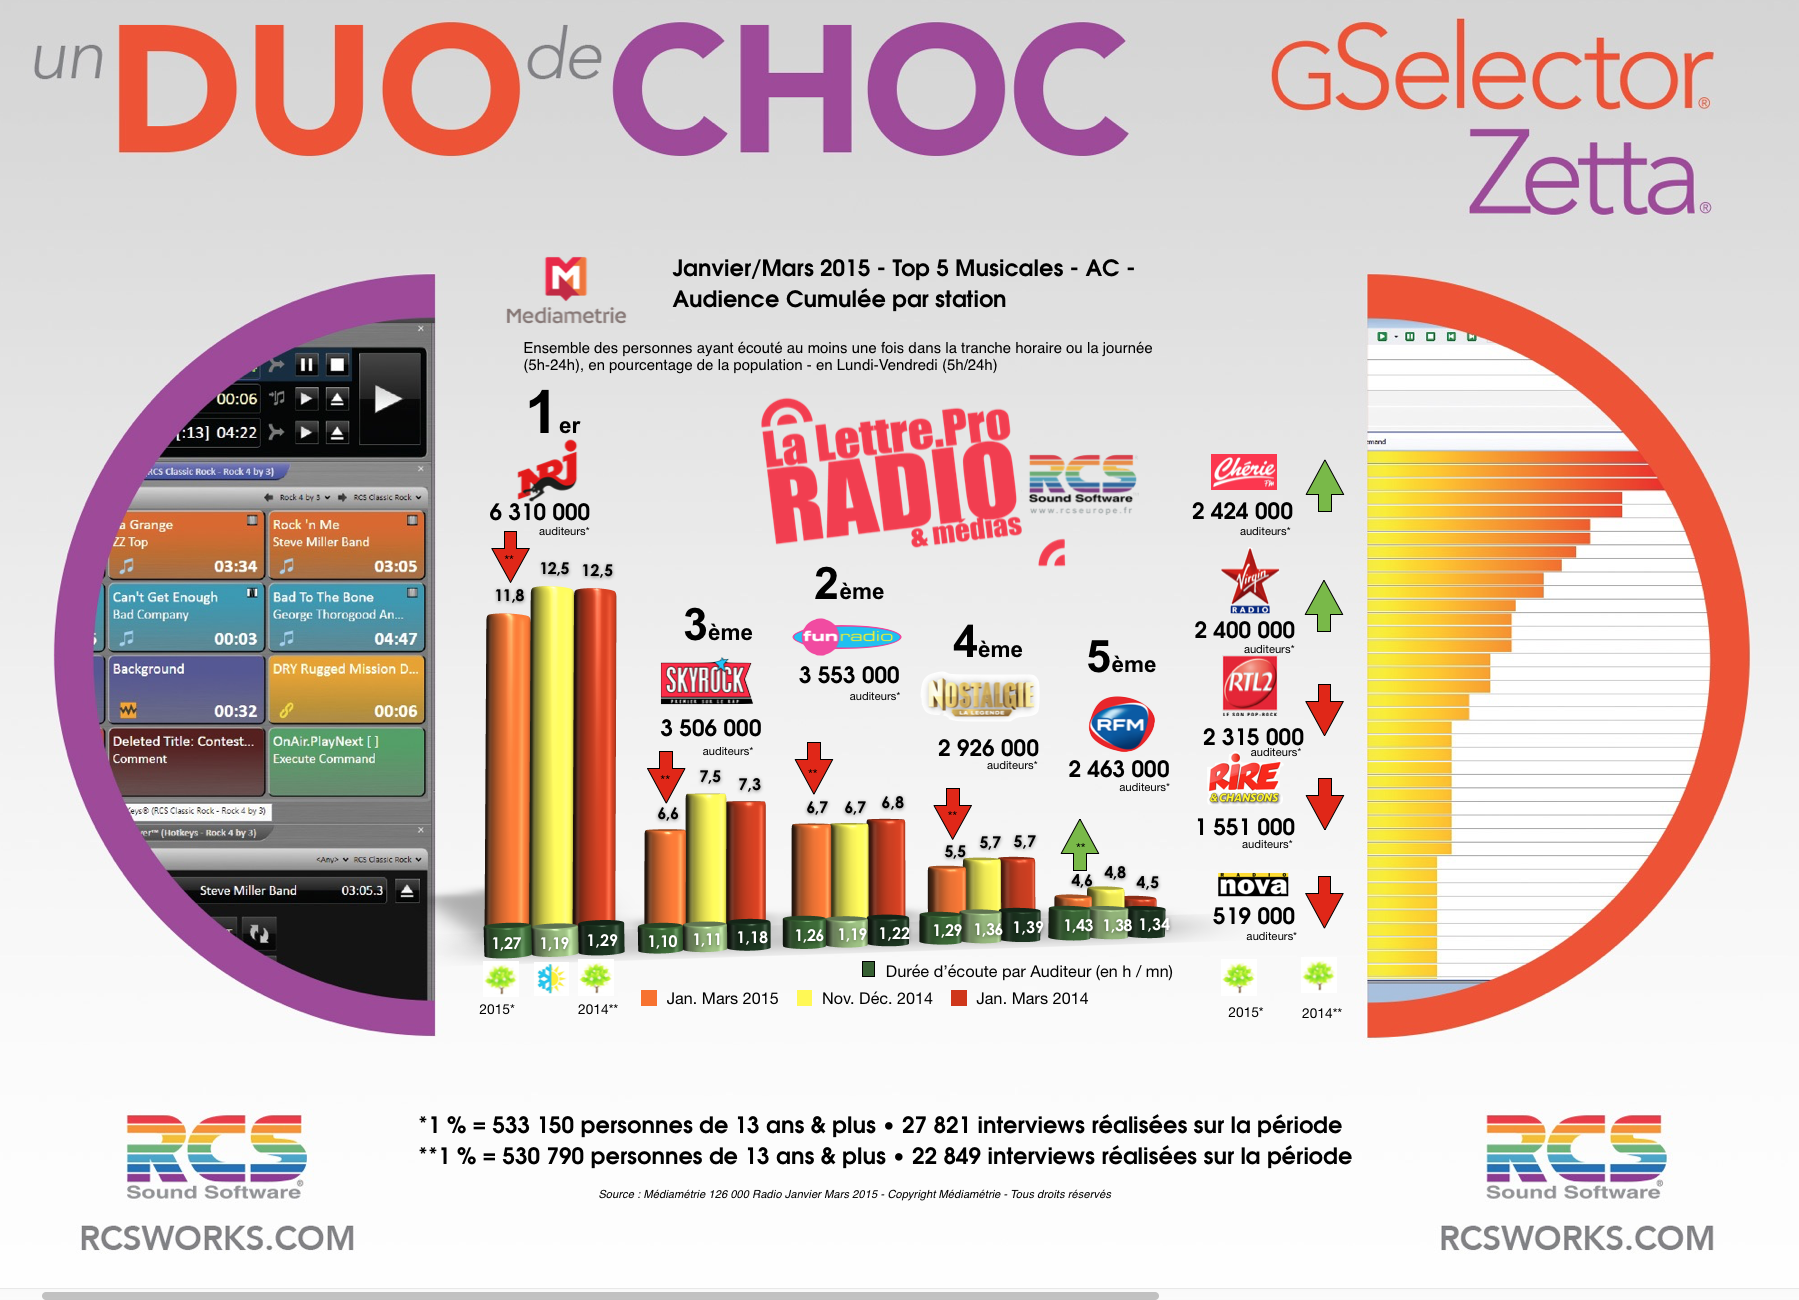 TOP 5 Musicales - Diagramme exclusif LLP/RCS GSelector-Zetta - Janvier-Mars 2015